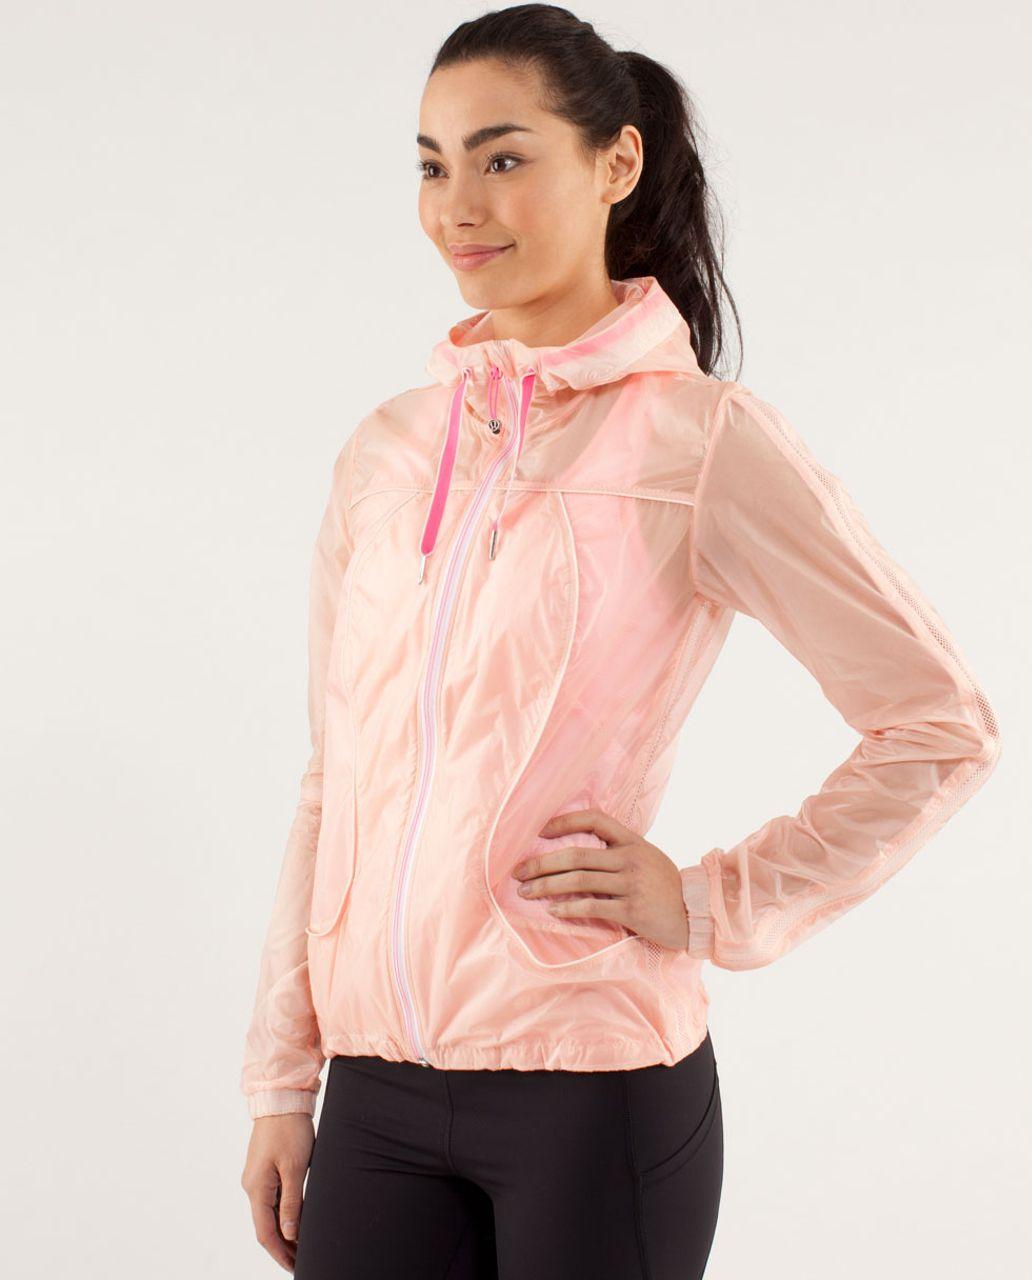 Lululemon Transparent-See Jacket - Parfait Pink / Pinkelicious